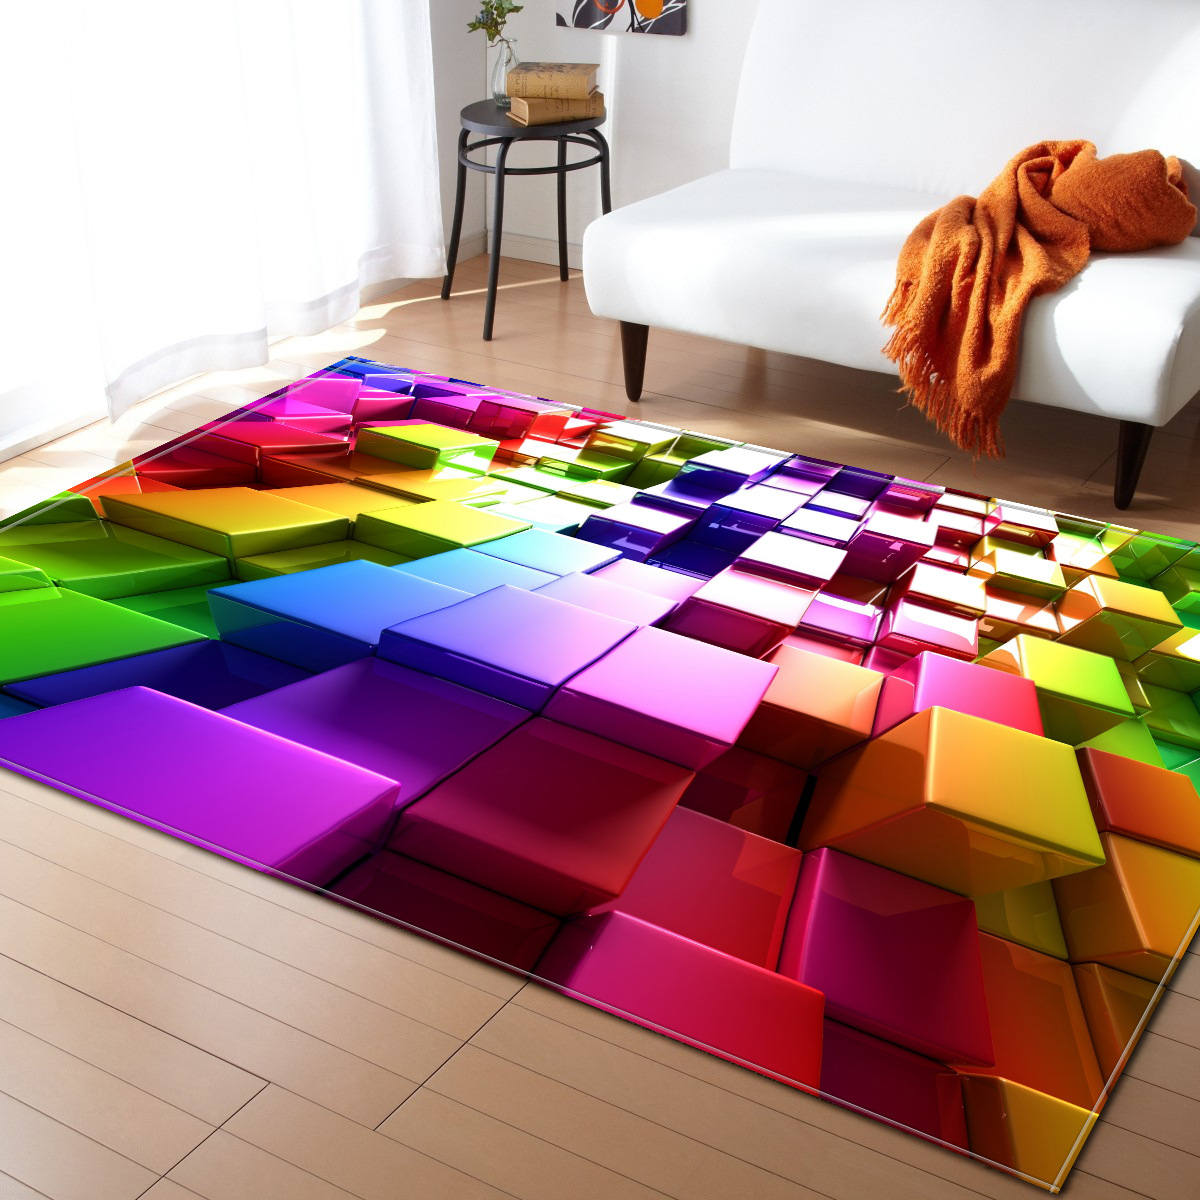 Nordic Style Geometric Pattern 3D Carpet Large Size Living Room Bedroom Tea Table Rug and Carpet Rectangular Antiskid Floor Mat Carpet     - title=